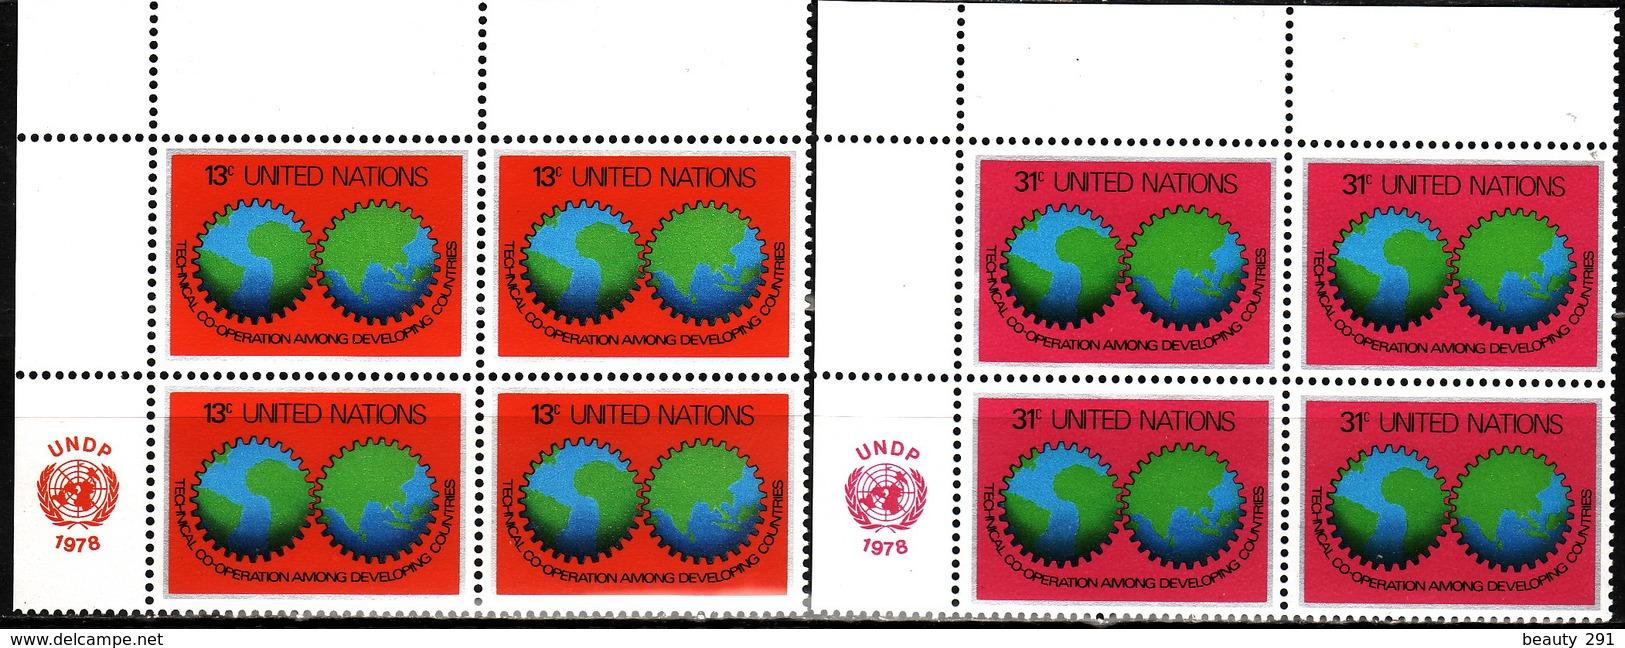 UN NEW YORK - 1978 - Mi 326-327 - BLOCK OF 4 - MNH** VF - New York -  VN Hauptquartier